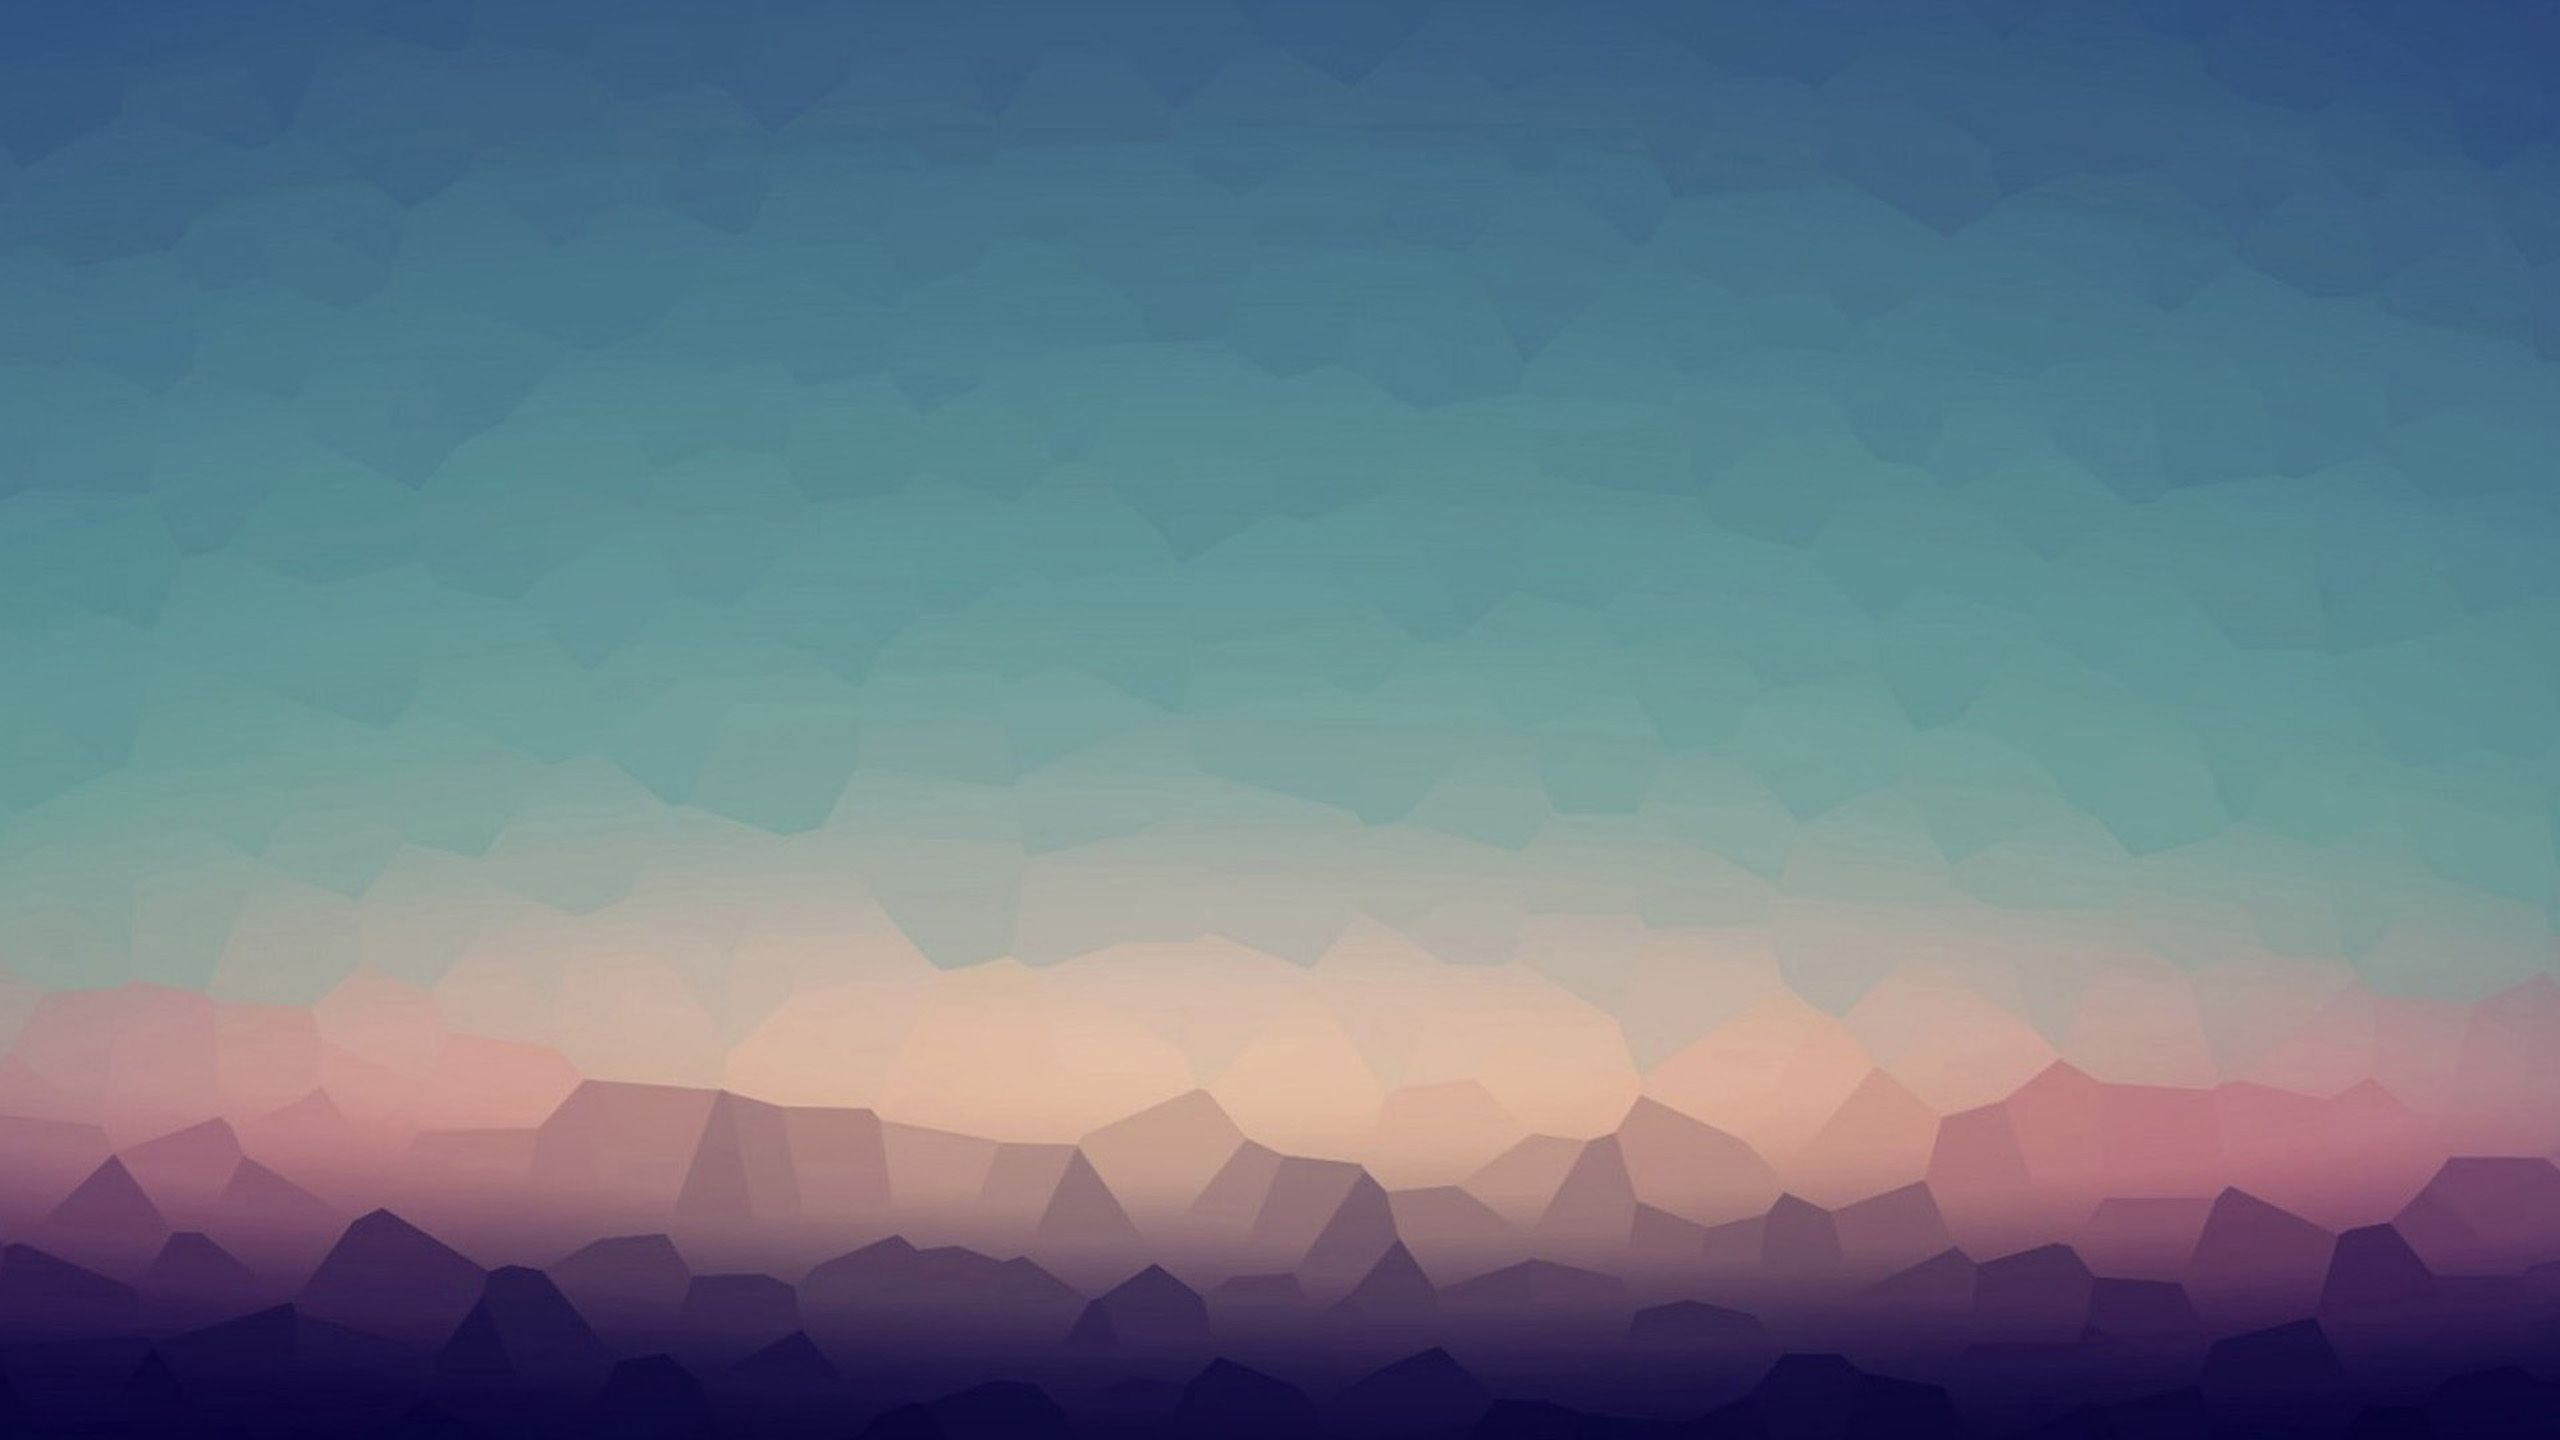 Hd Desktop Wallpapers Macbook Wallpaper Mac Wallpaper Simple Wallpapers